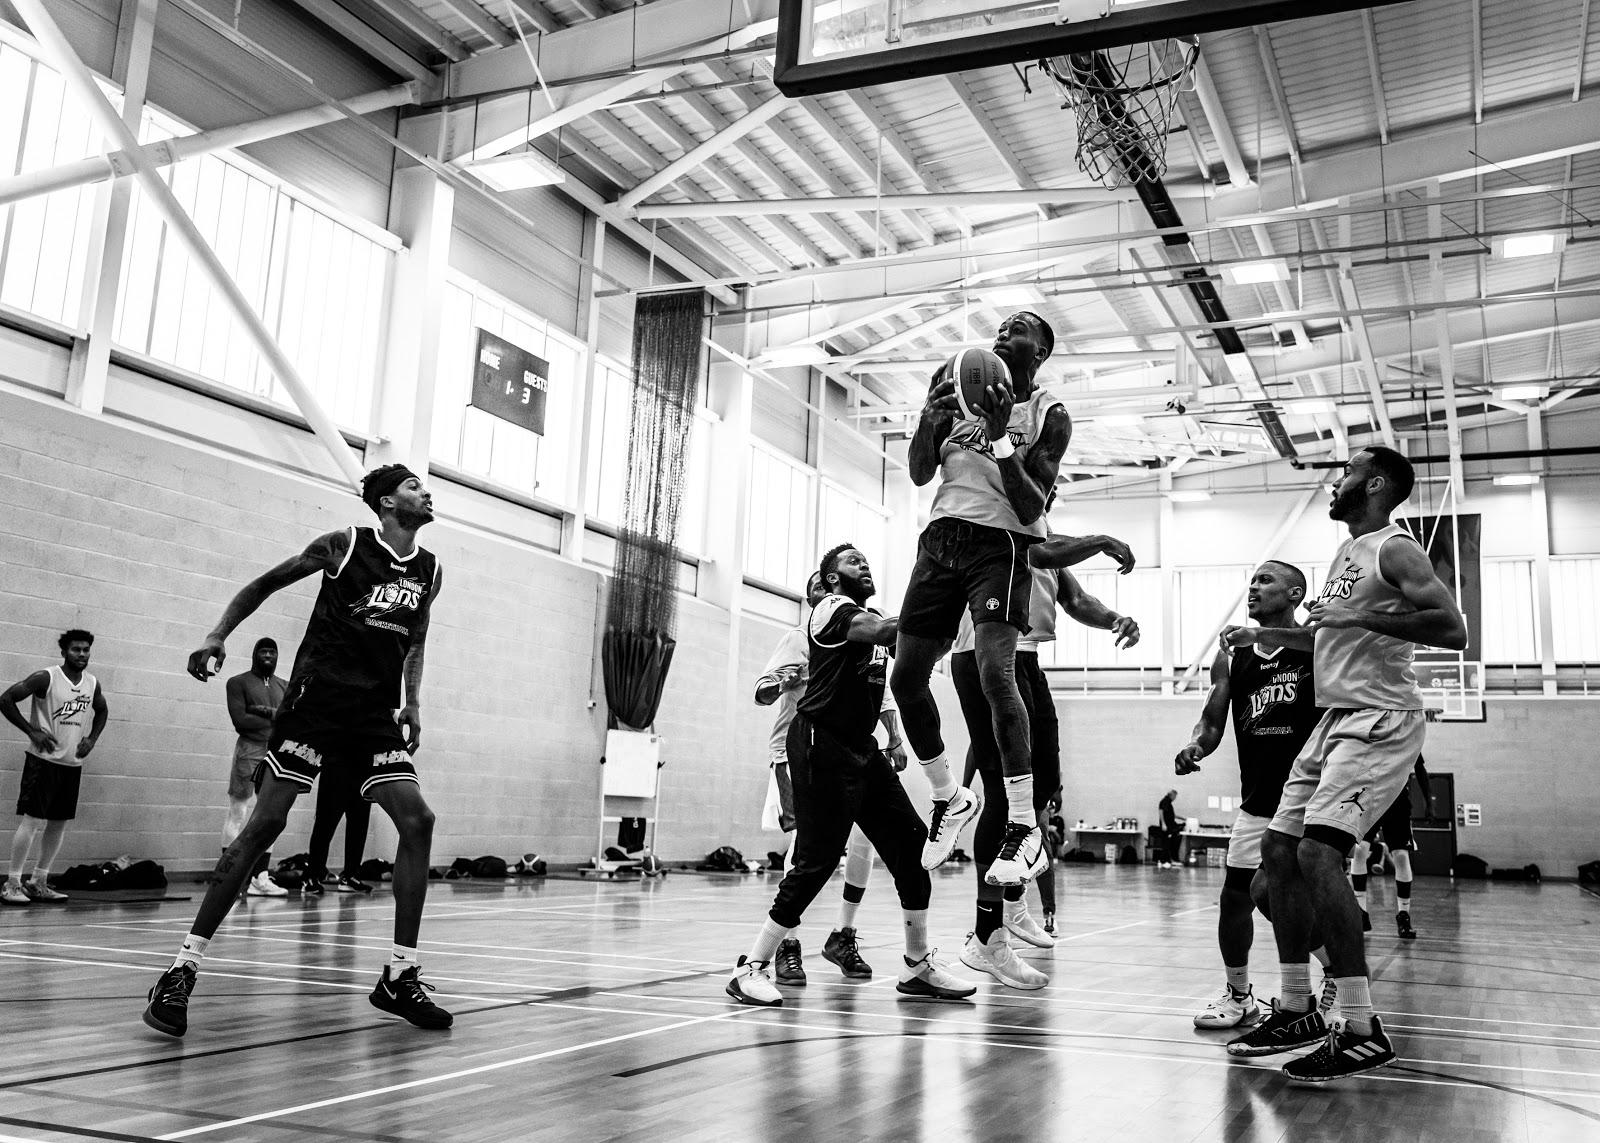 london lions playing basketball